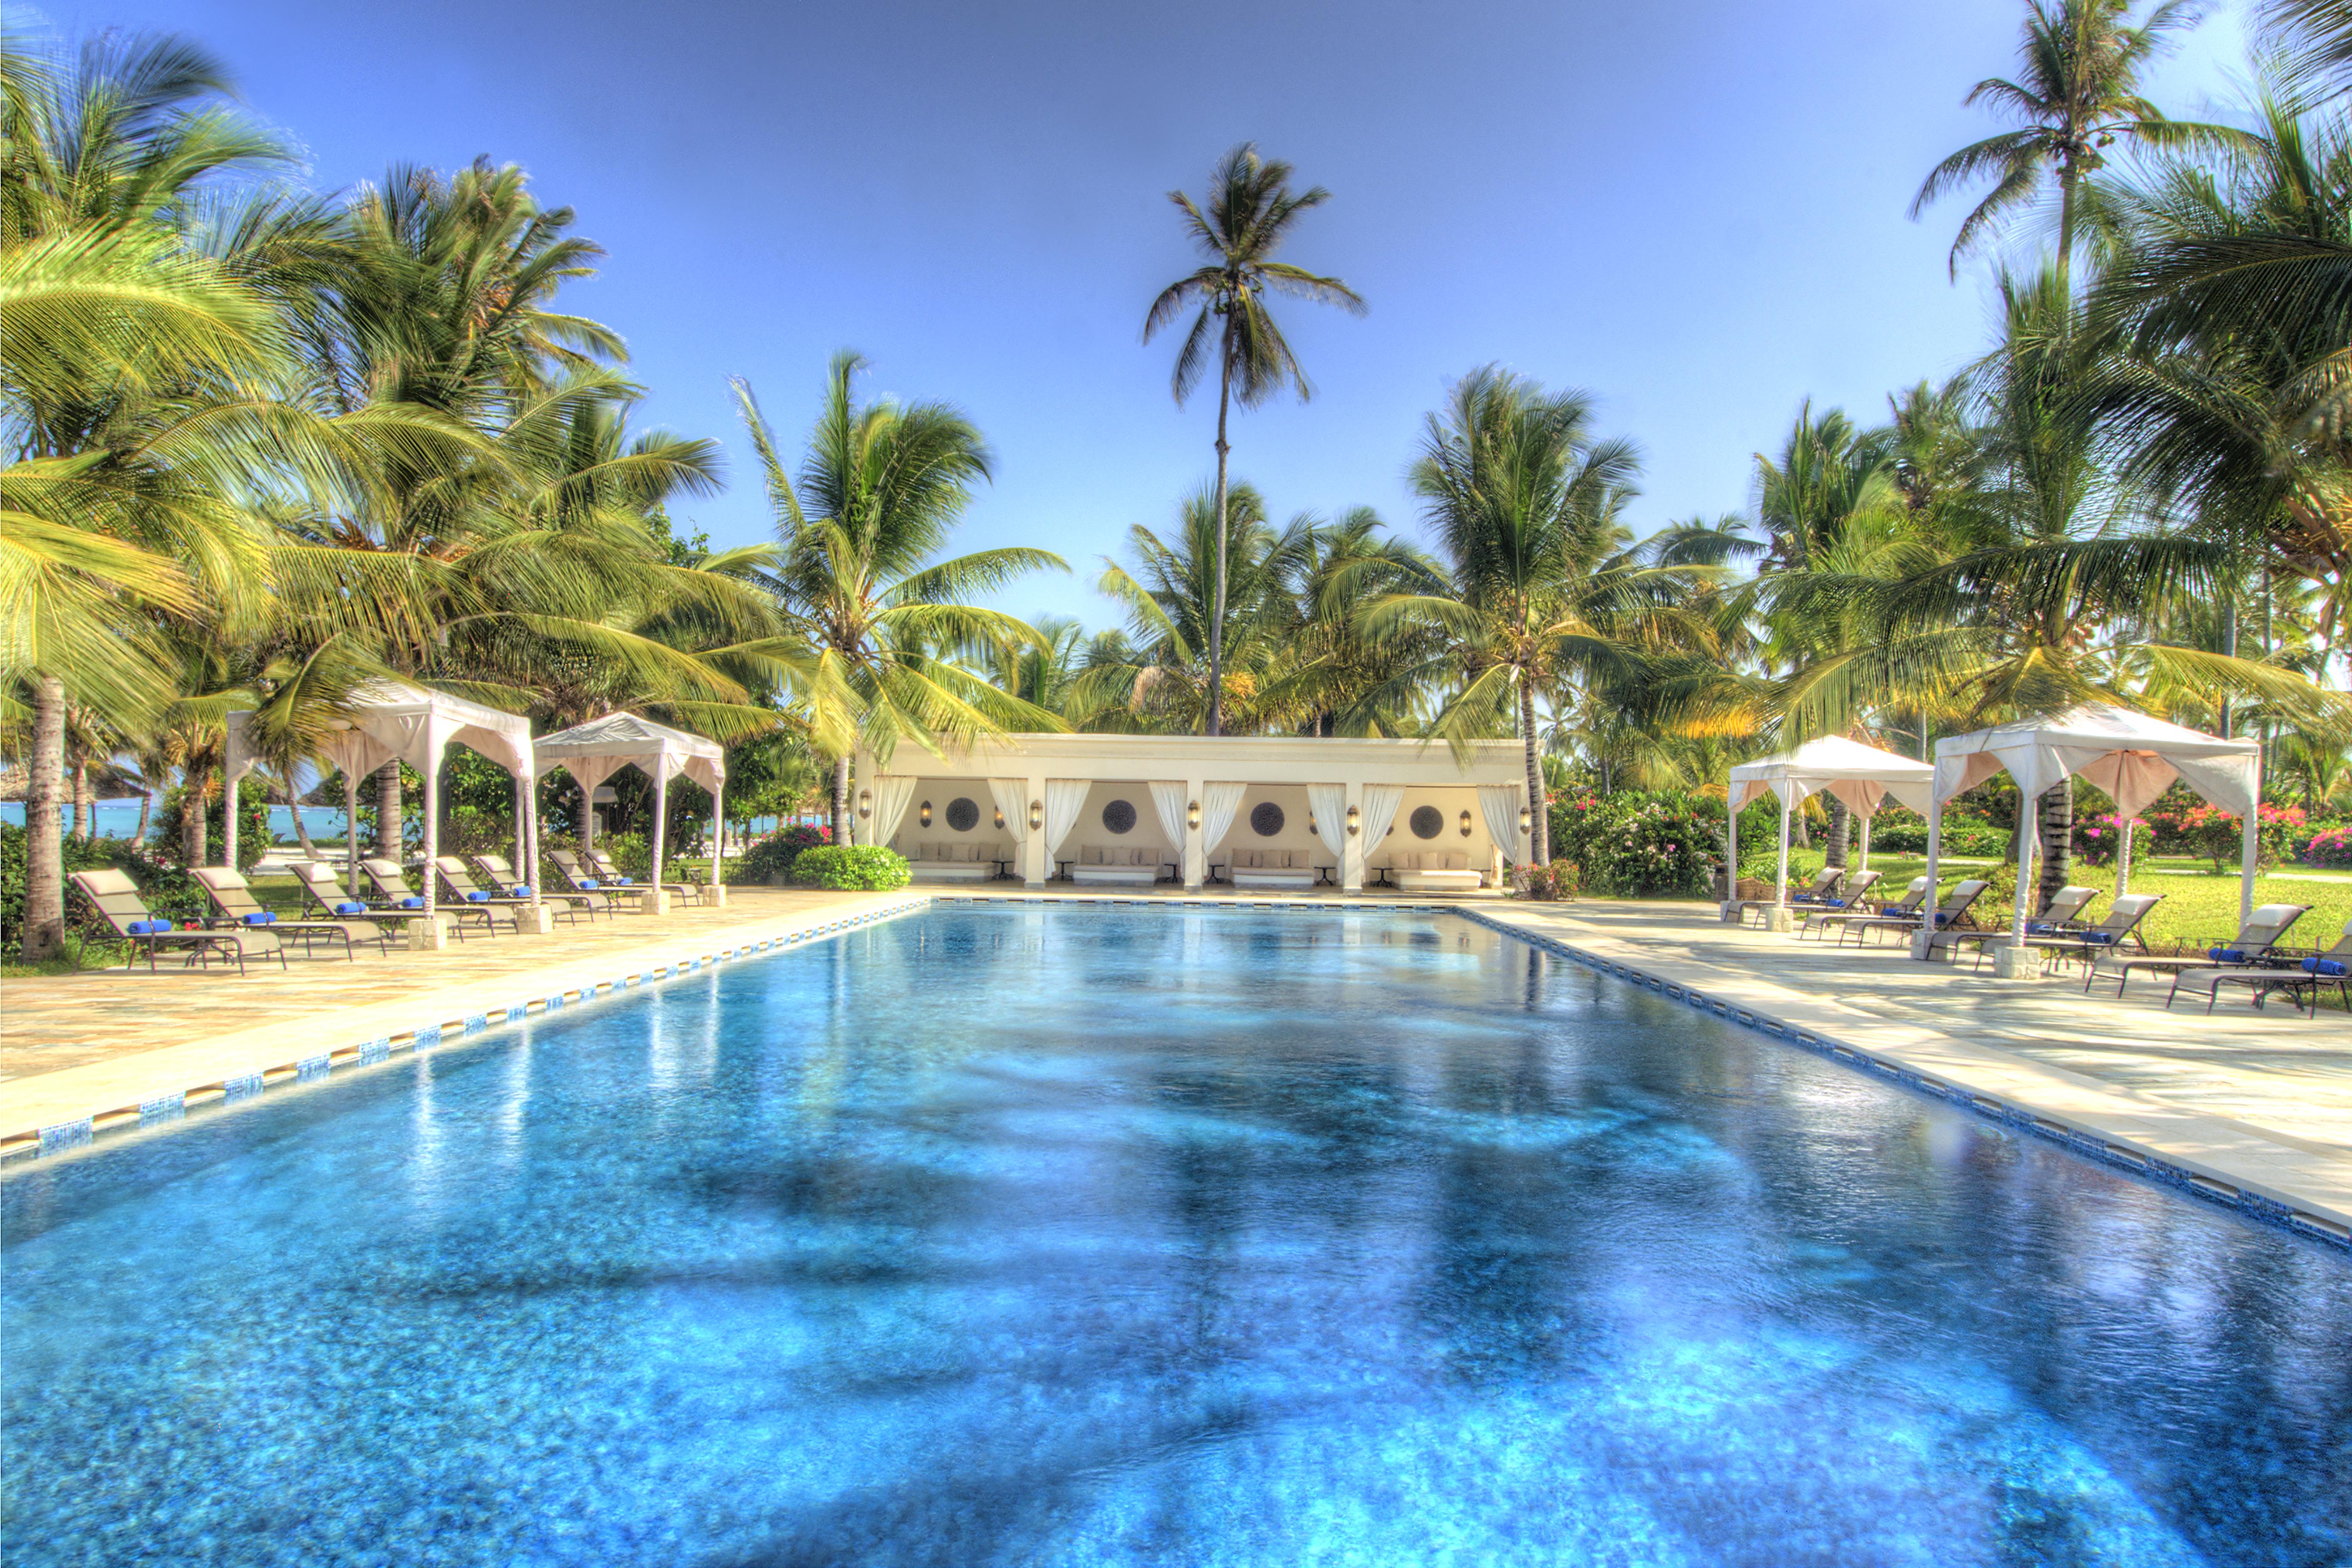 Baraza-luxury-zanzibar-hotel